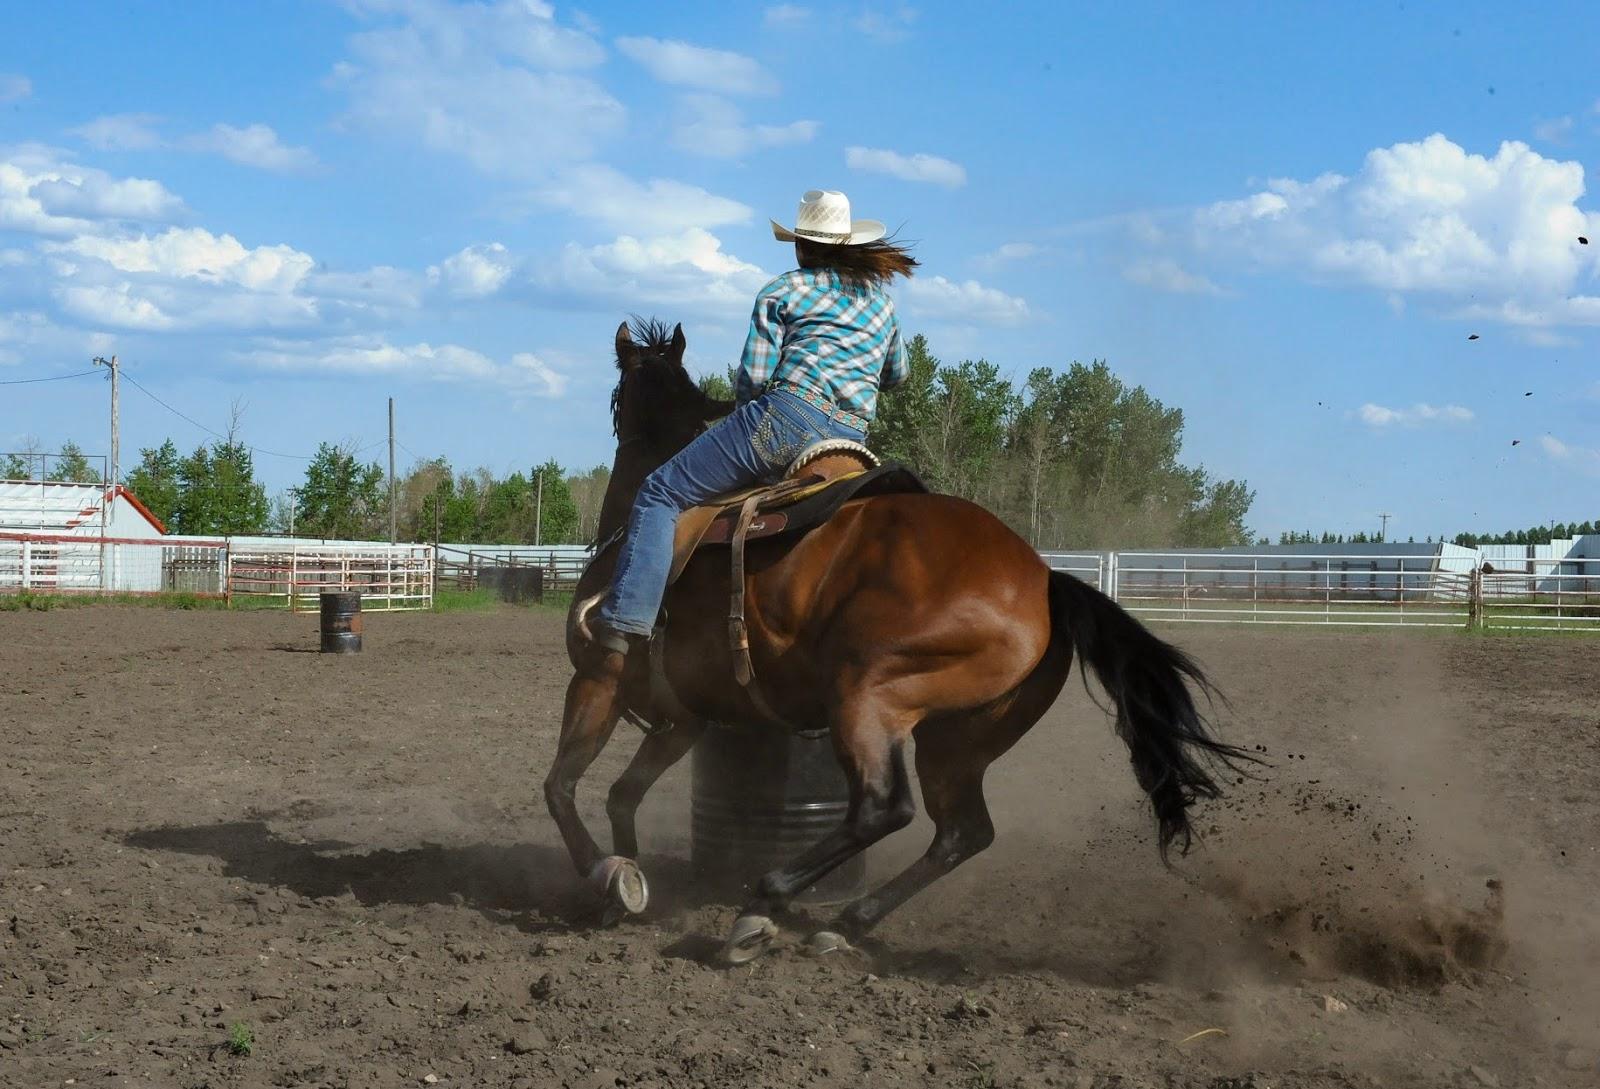 Tees Rodeo, Lacombe